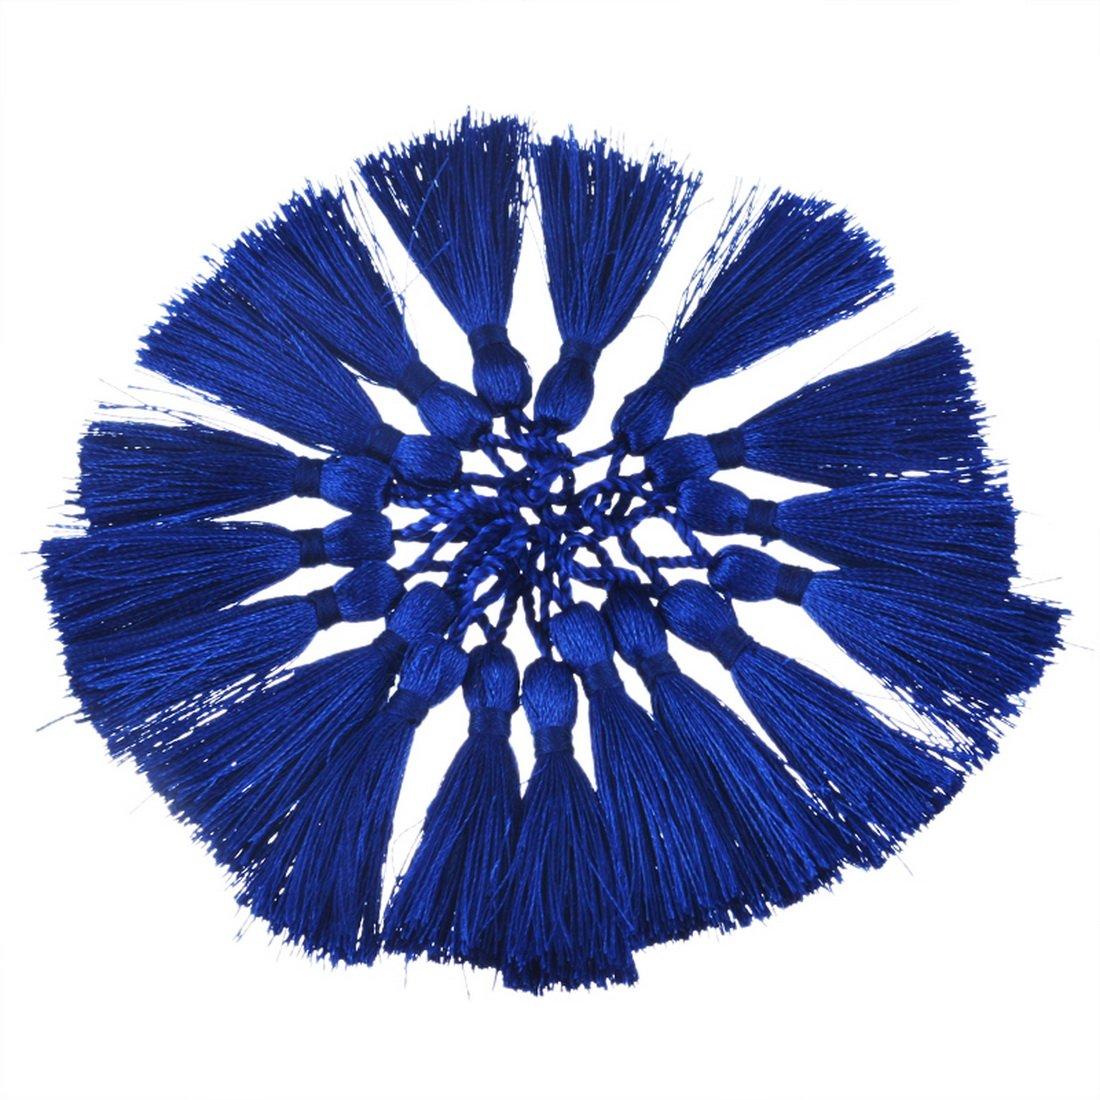 Souarts 手芸用品 DIY材料 ハンドメイド タッセル アクセサリー パーツ 50本入り 4cm ブルー   B01HEIZ8HA